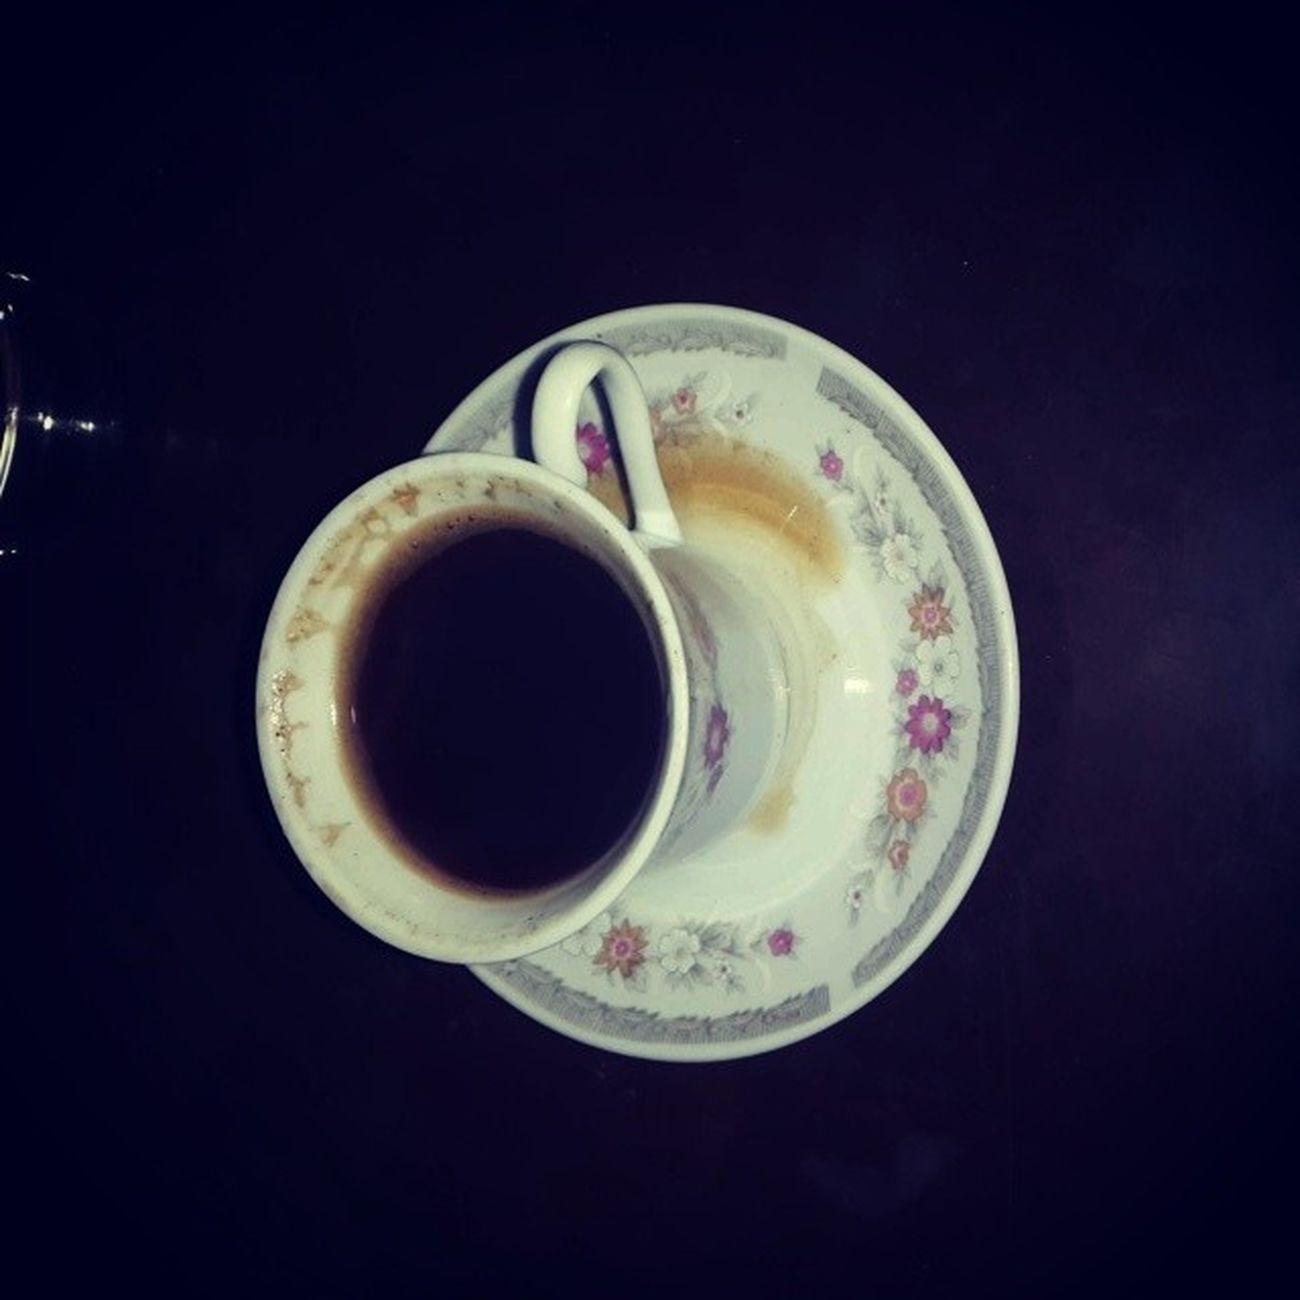 Kahve Sıcak Muhabbet Iyi akşamlar